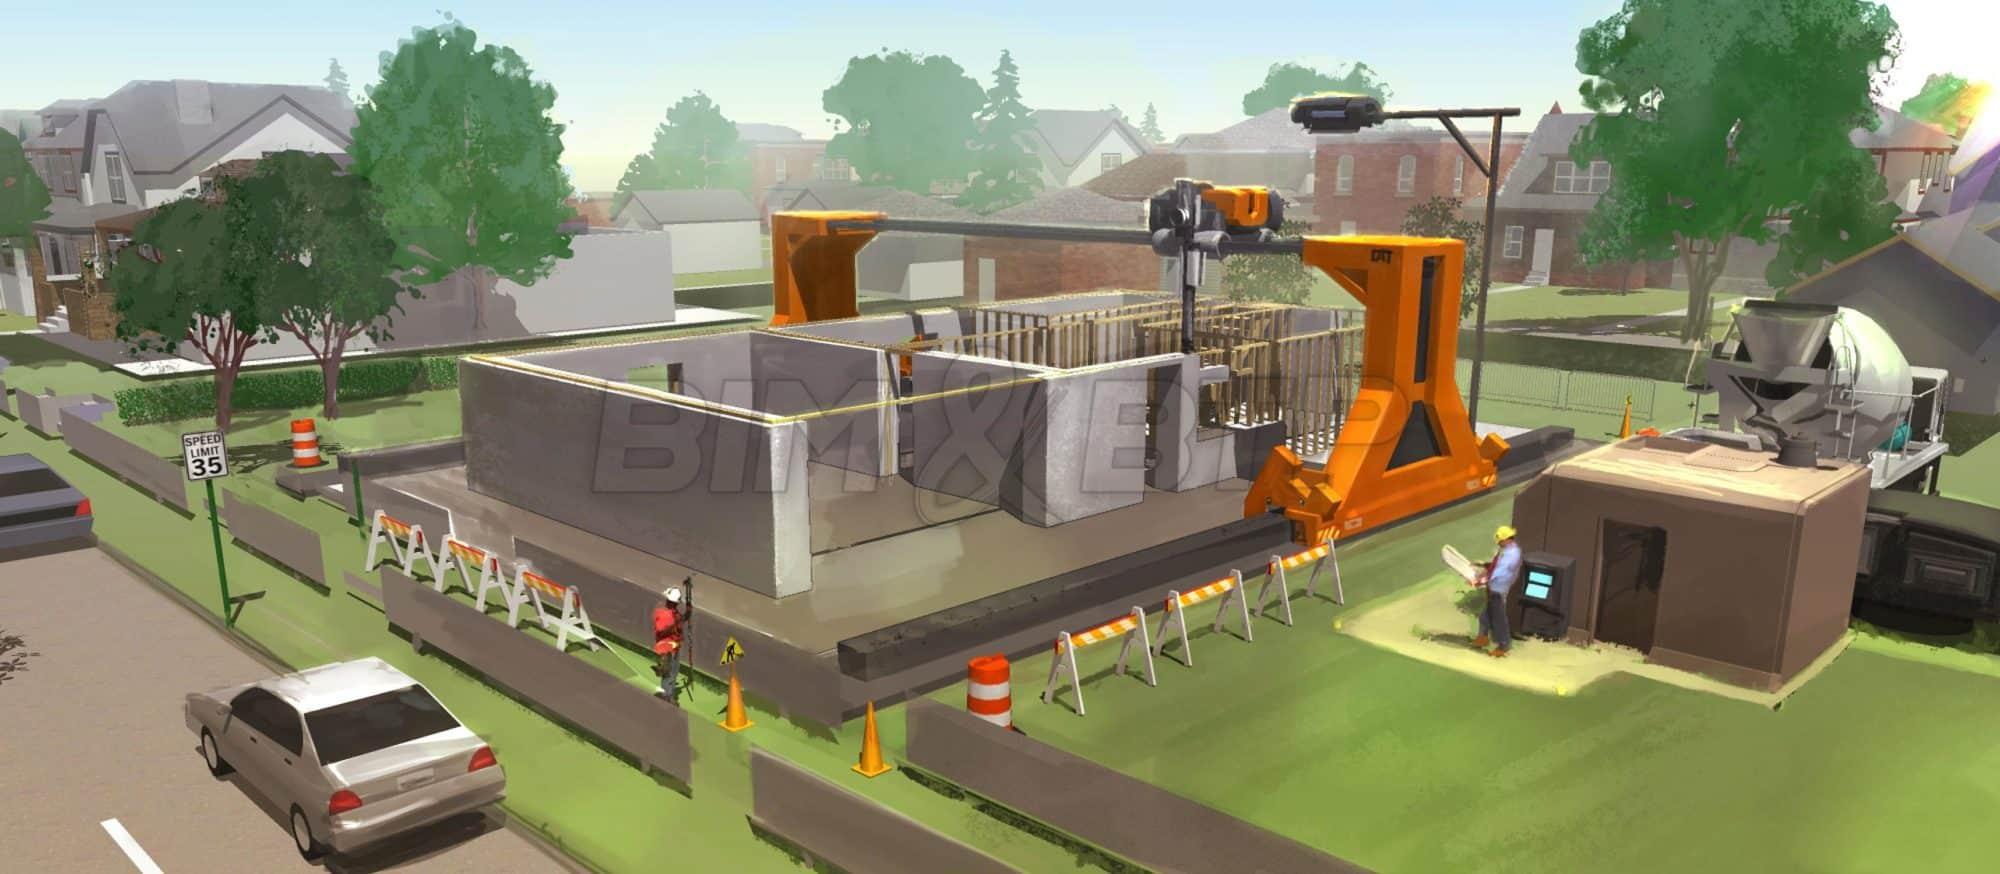 Vision futuriste de la construction